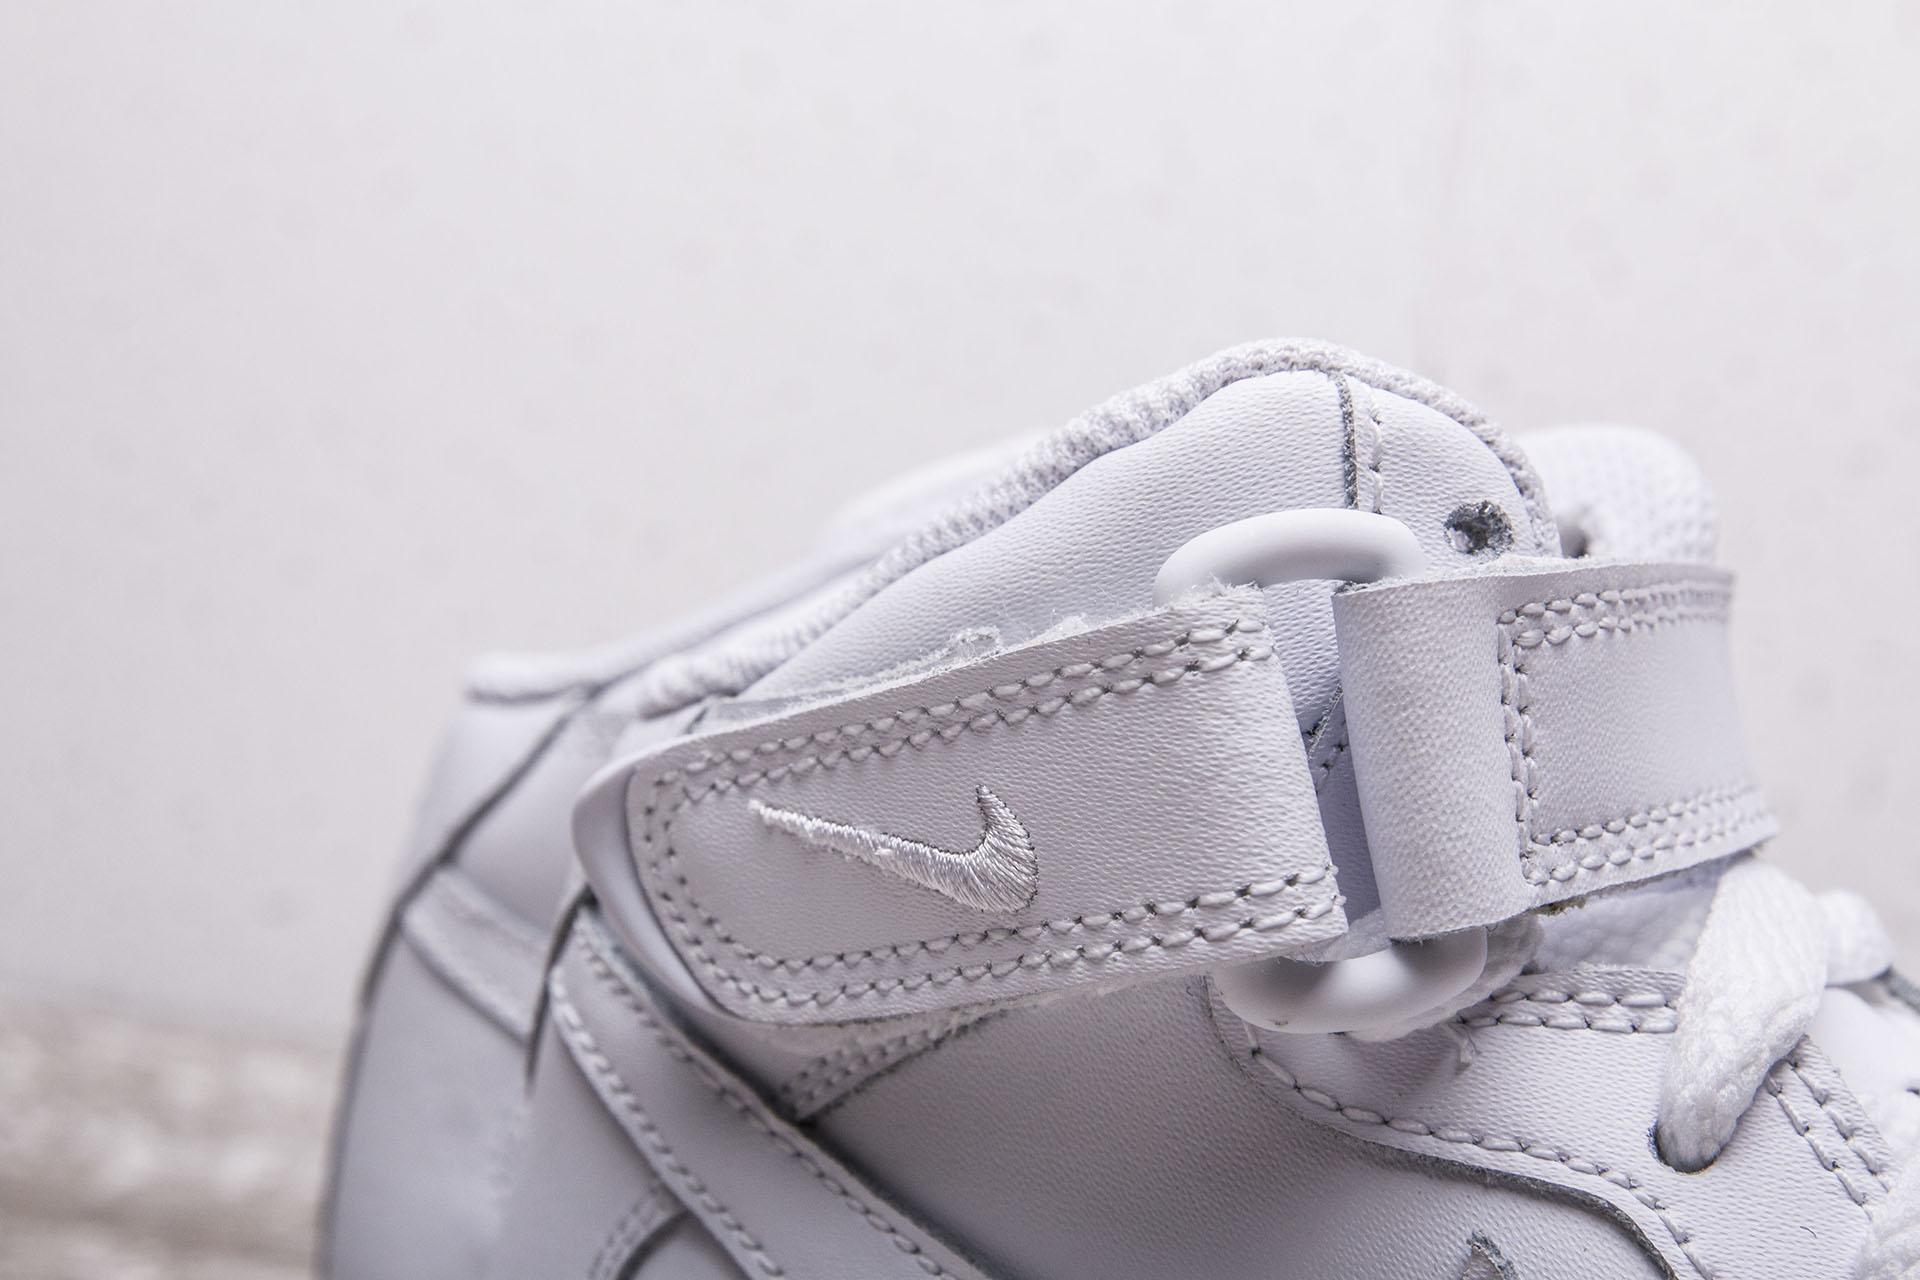 0859dbbb ... Купить детские белые кроссовки Nike Air Force 1 Mid GS - фото 3  картинки ...